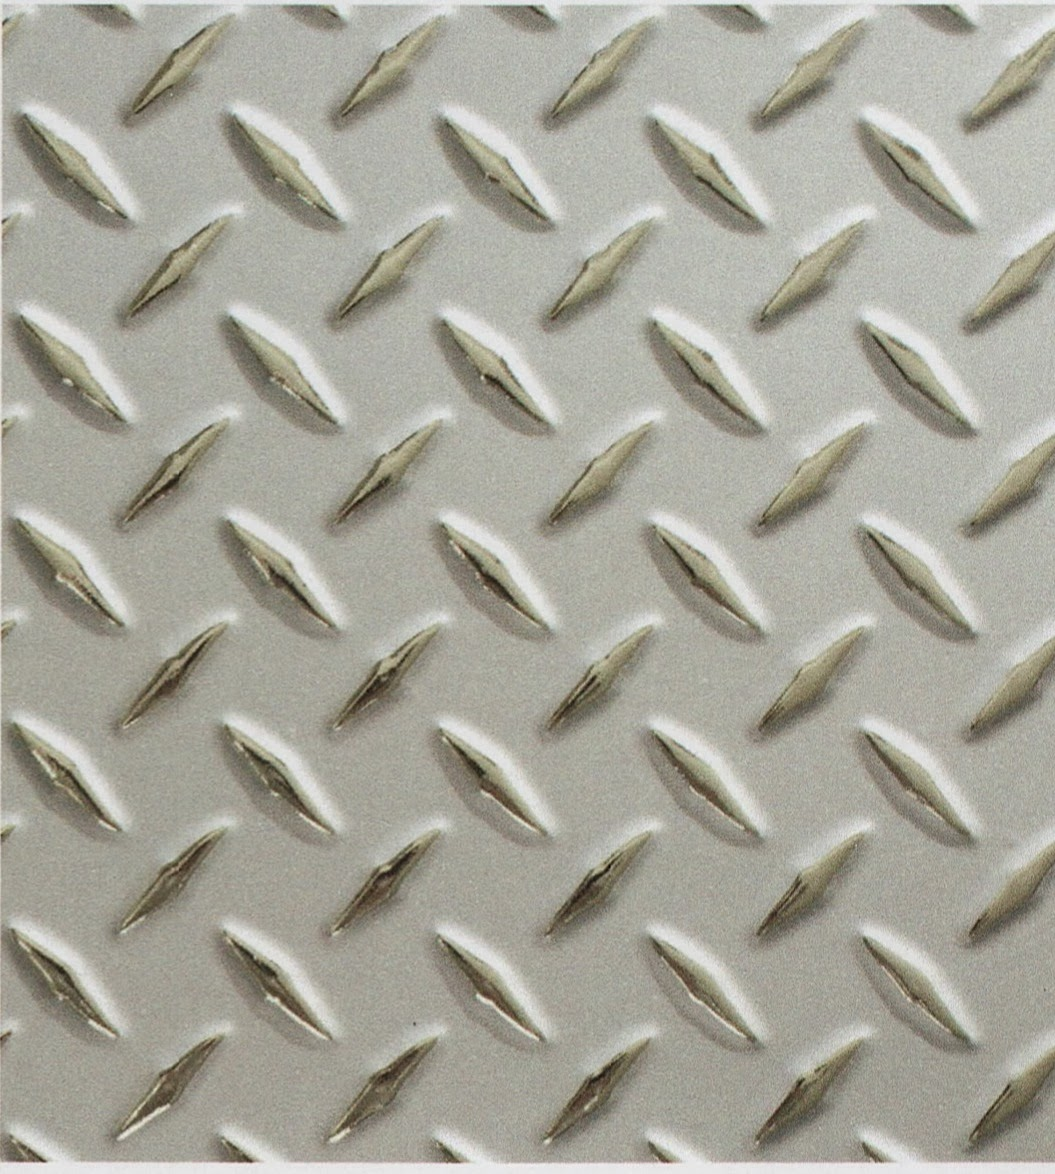 Argent Silver u0026 Chrome Diamond Plate  sc 1 st  Chrome Plastic Diamond Plate sheets - Blogger & Two Tone Diamond Plate Plastic Sheets | Chrome Plastic Diamond Plate ...